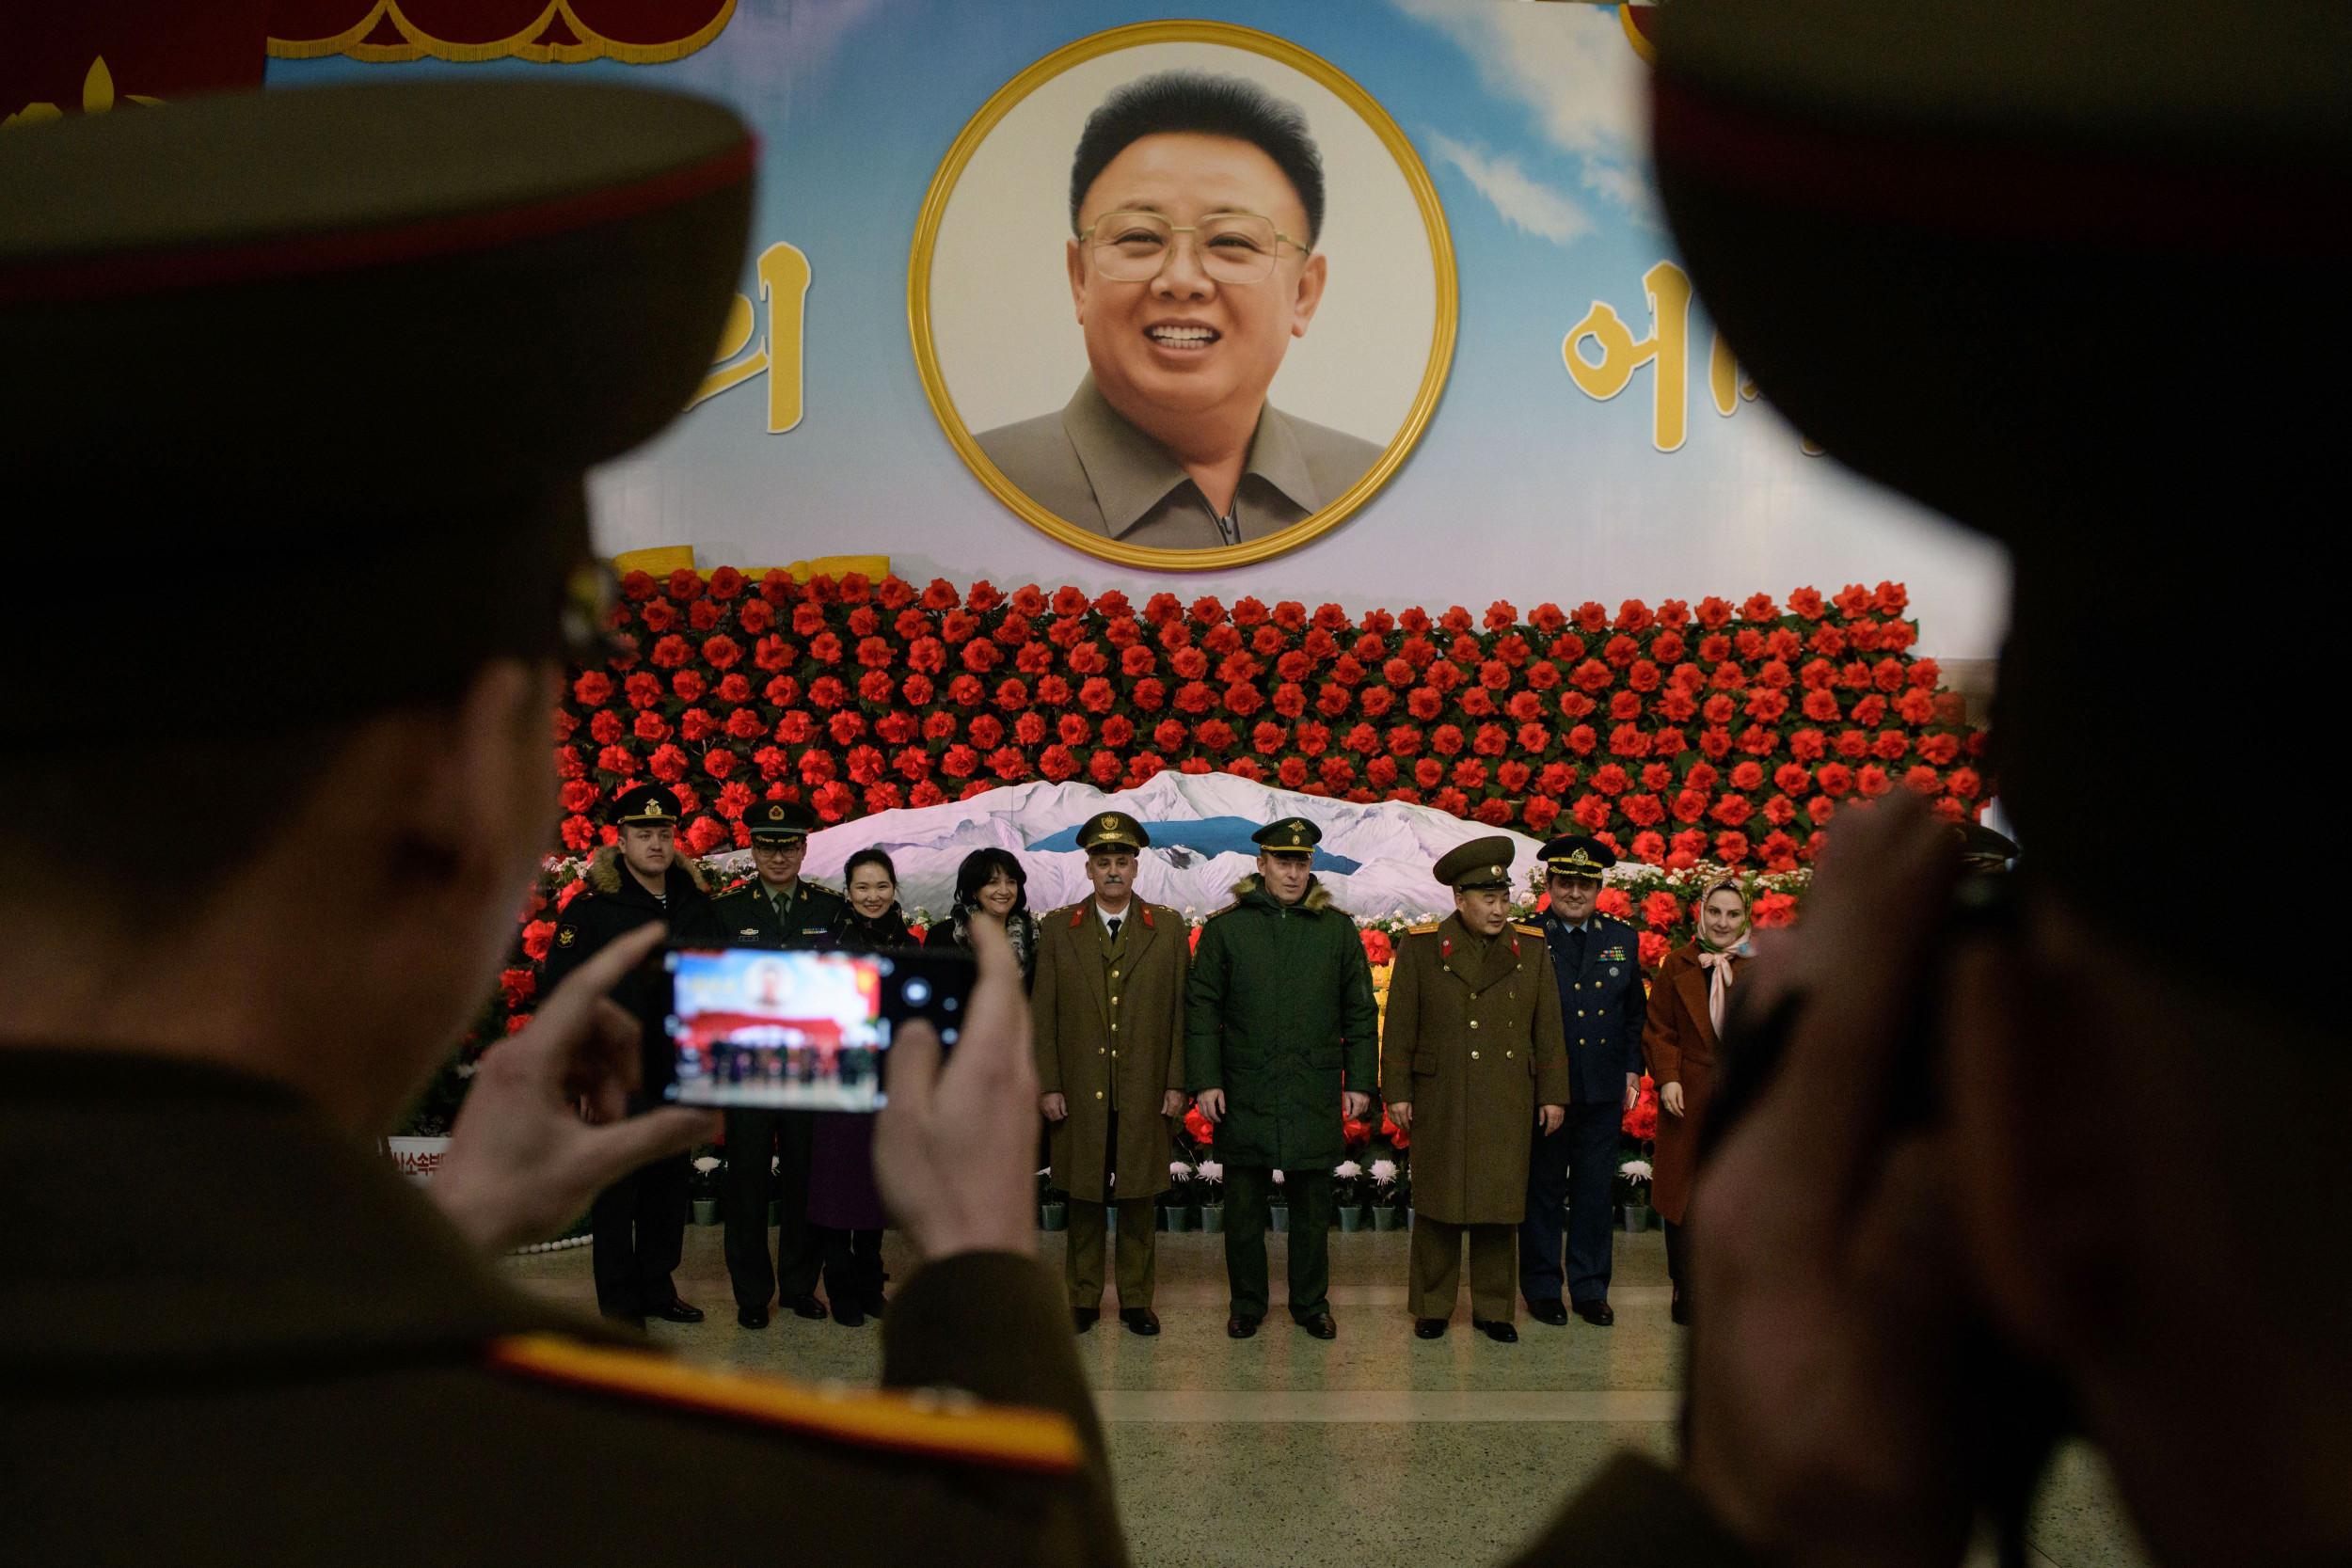 China, Russia, North Korea, Iran Build Ties as U.N. Friends Feud with U.S.